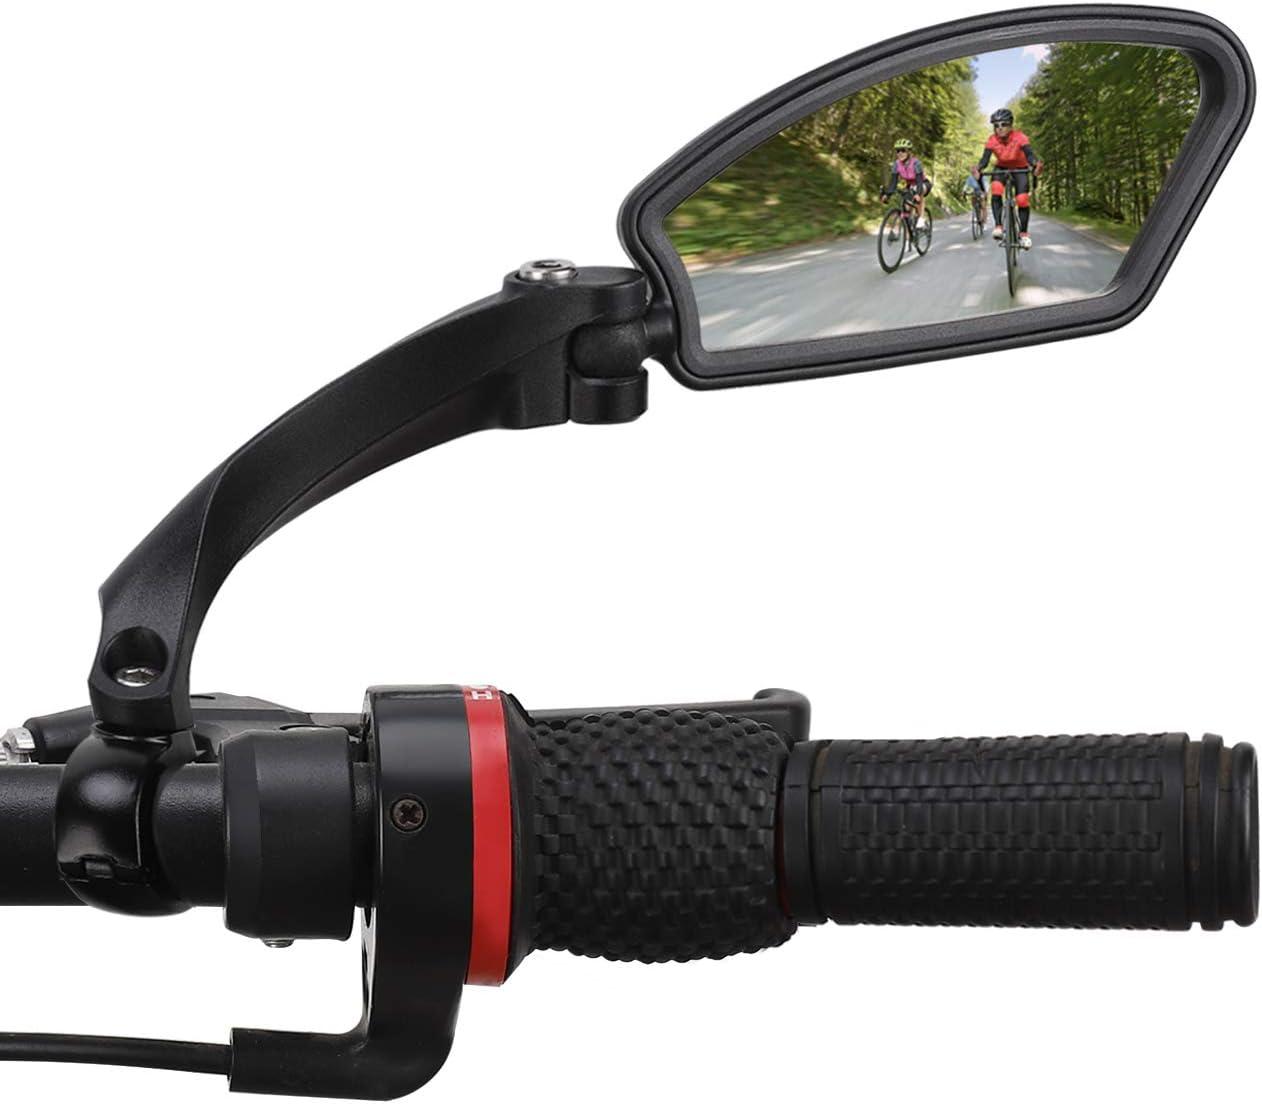 wishing Fahrradspiegel Lenker-Fahrradspiegel Edelstahl HD Schlagfest R/ückspiegel 360/° Drehungs/überpr/üfung Lenkerspiegel f/ür 21-26 mm Rennrad Mountainbike E-Bike